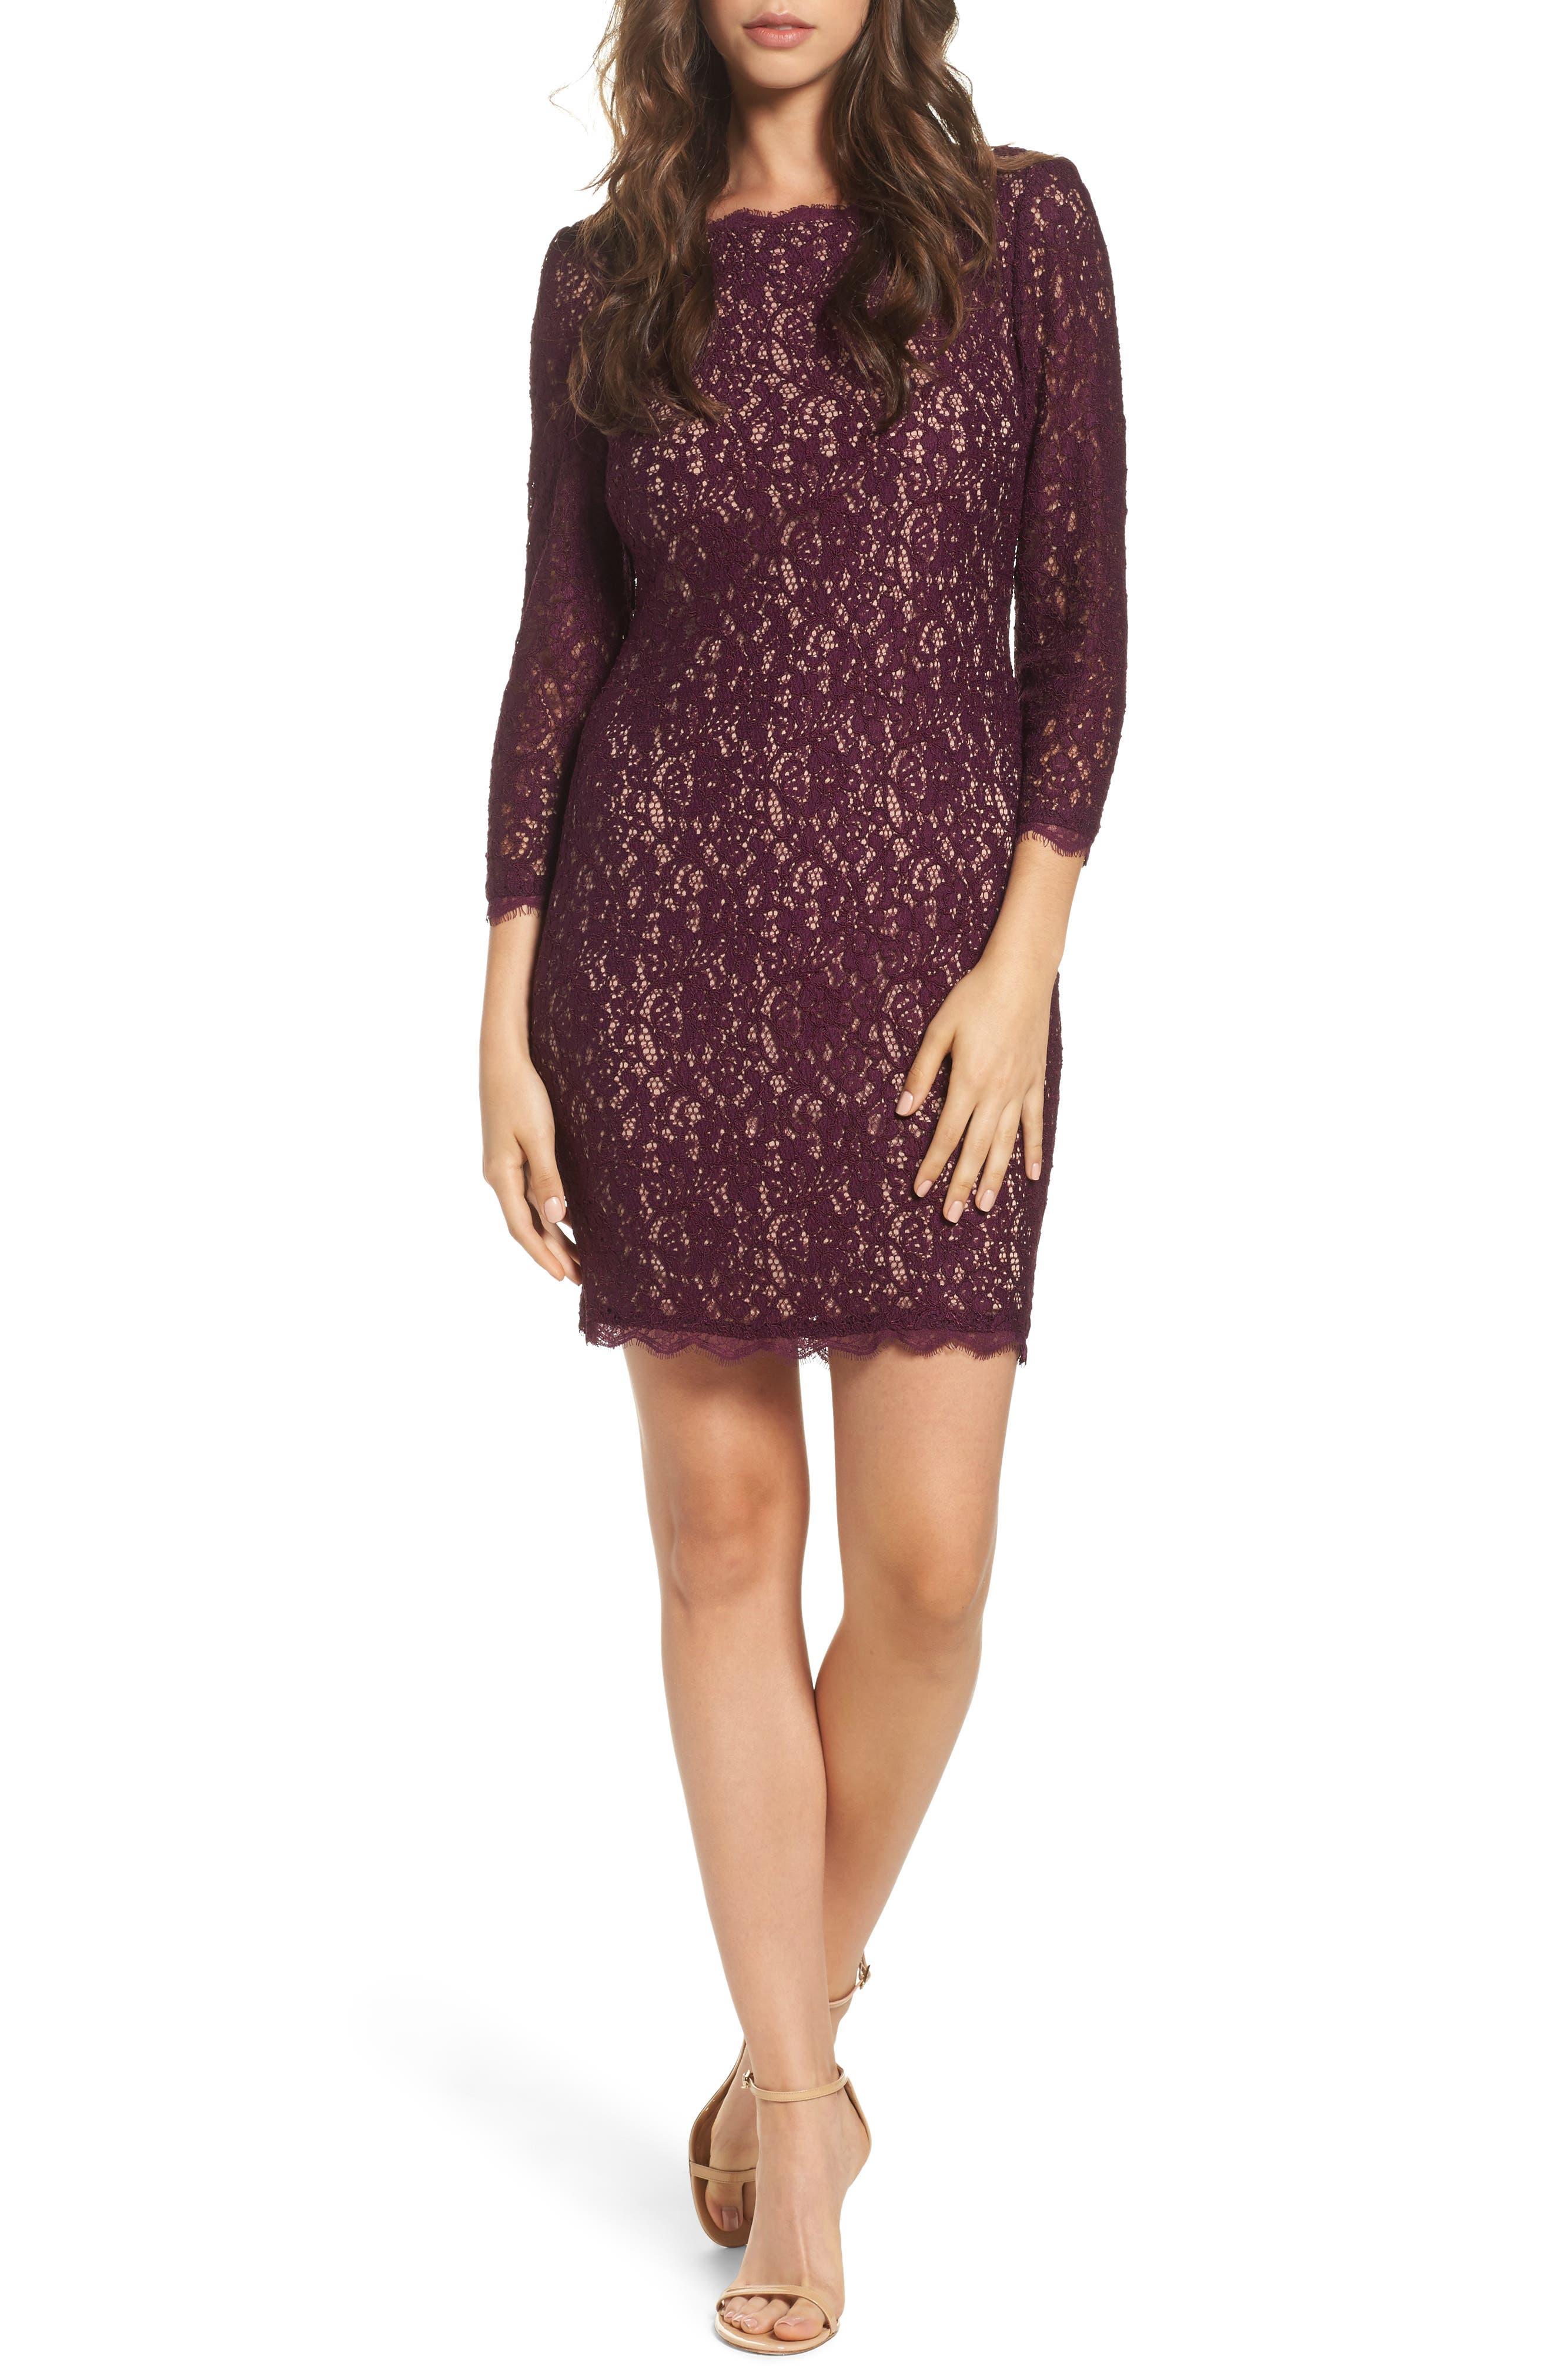 Main Image - Adrianna Papell Lace Overlay Sheath Dress (Regular & Petite)